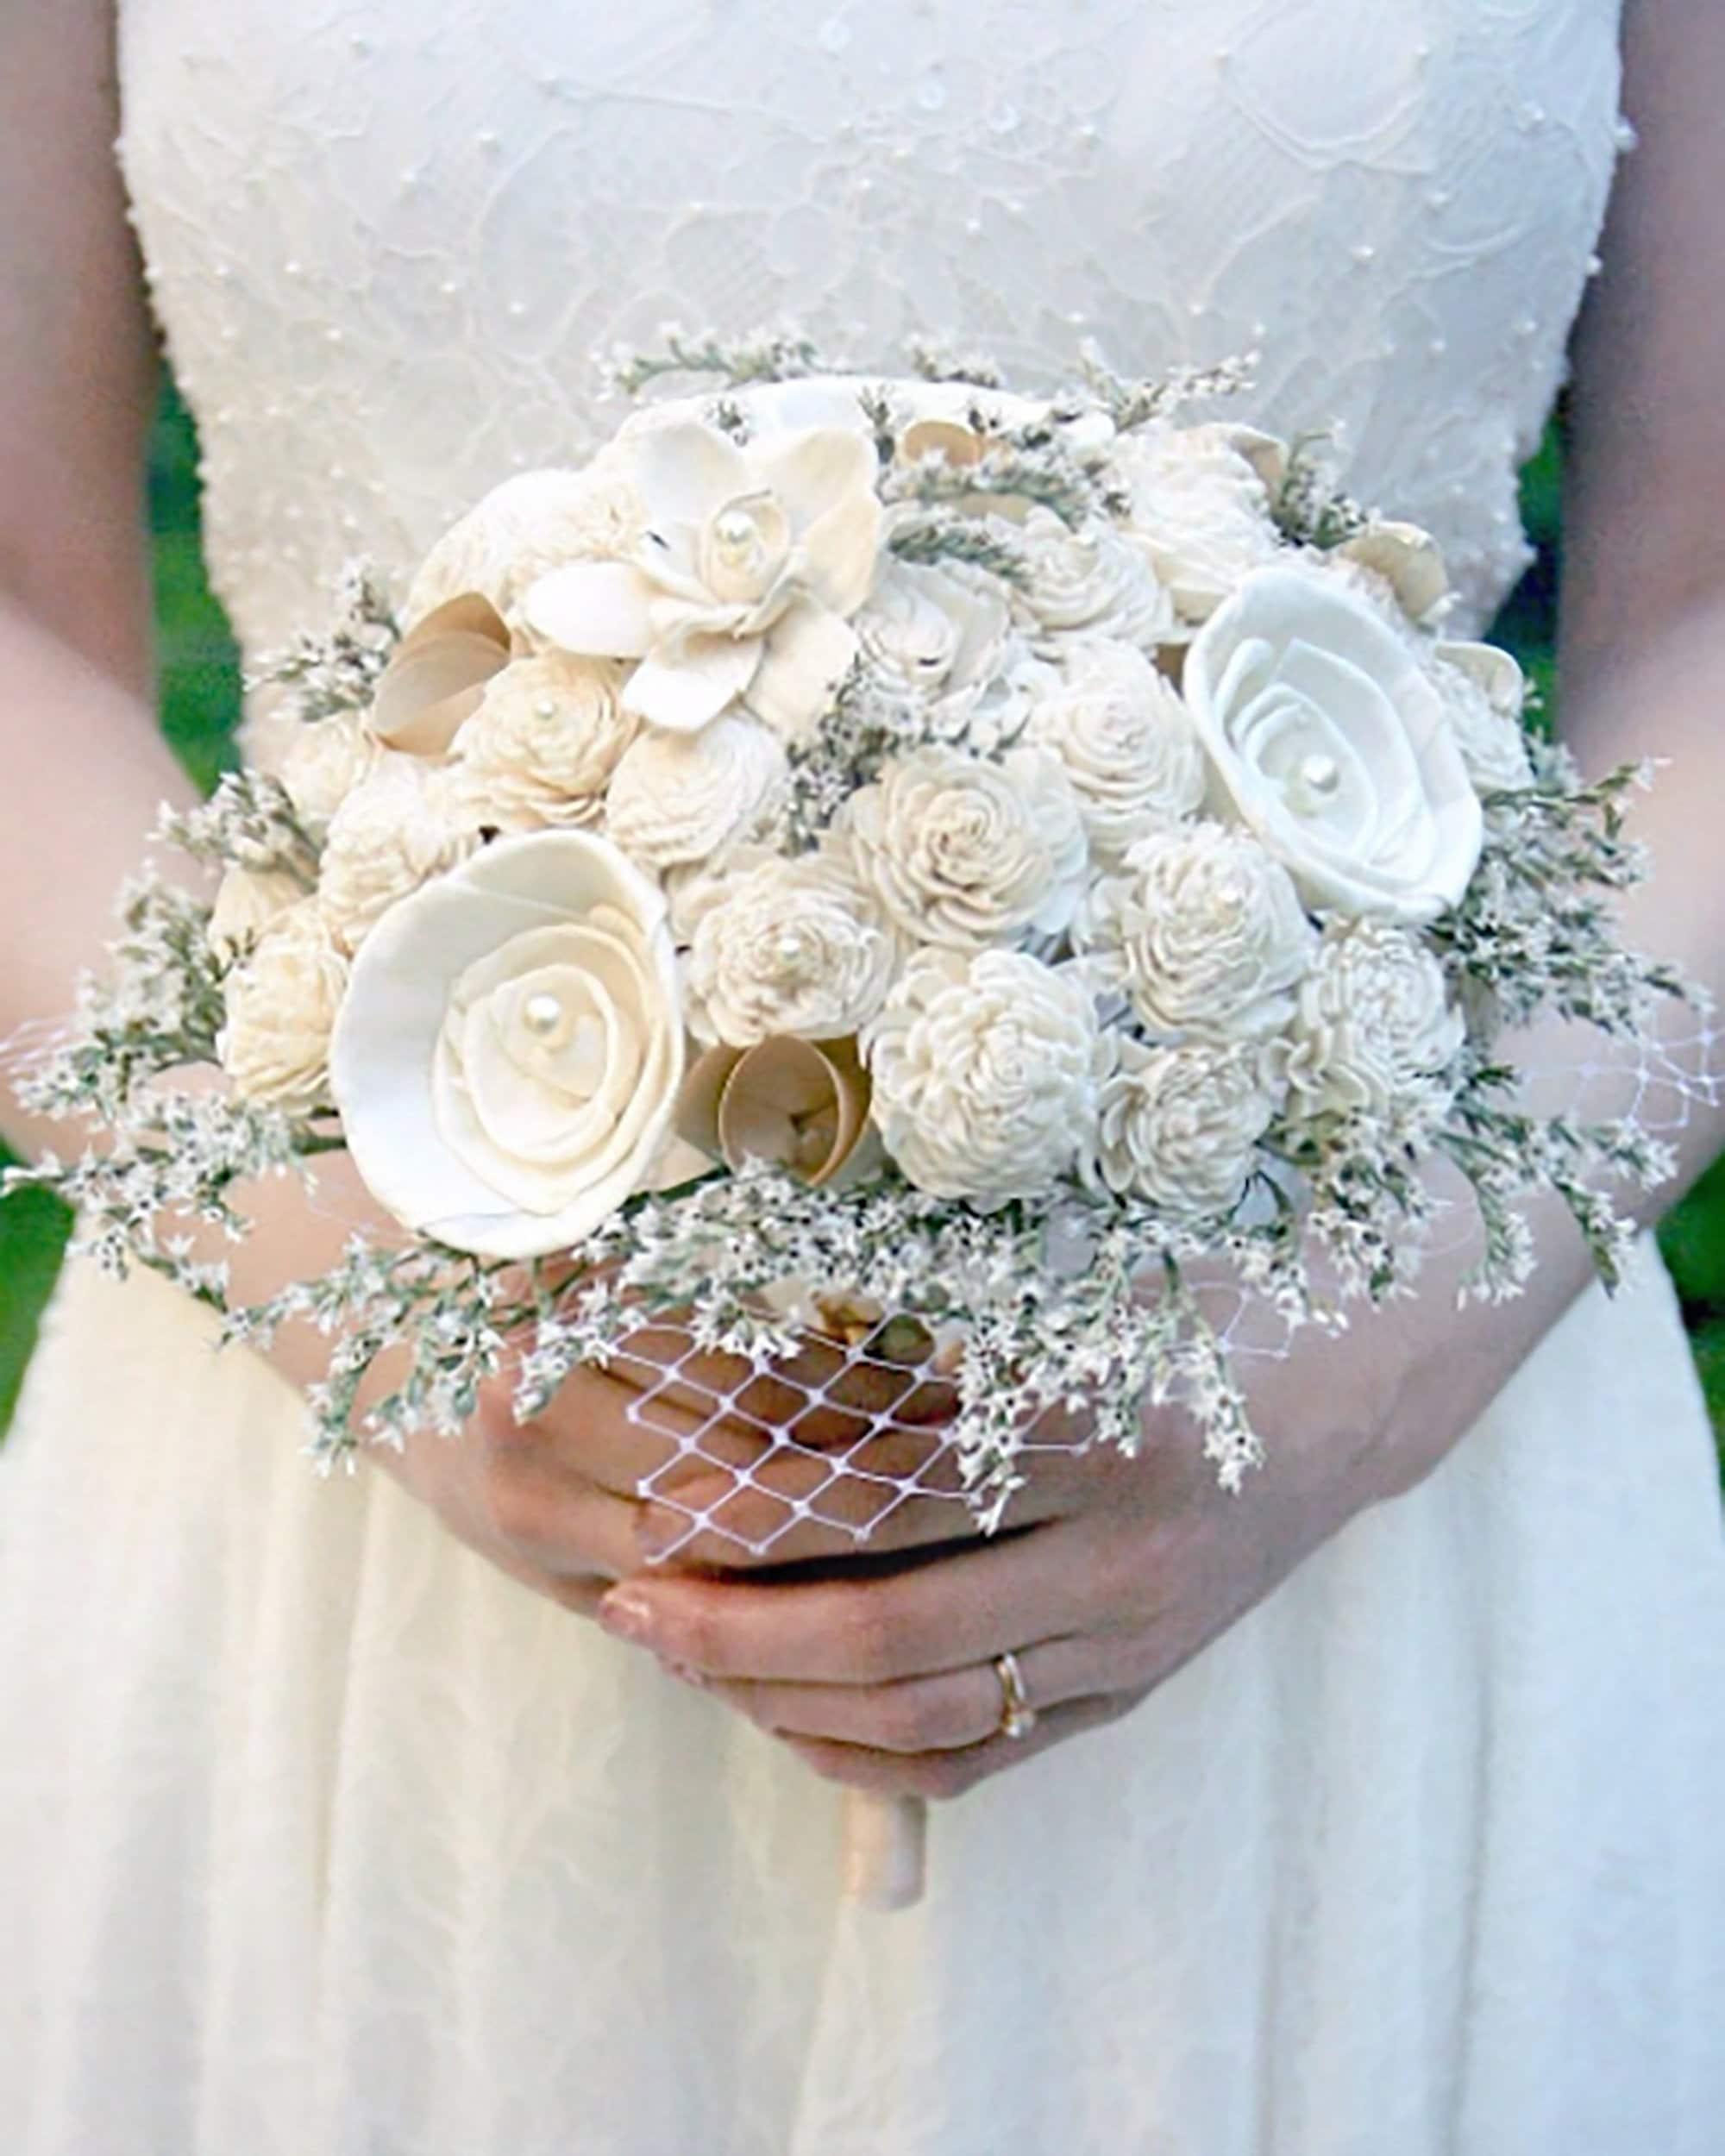 wedding flowers vintage boho style wedding // art deco wedding bouquet  vintage book flowers sola wood bouquet vintage bridal bouquet